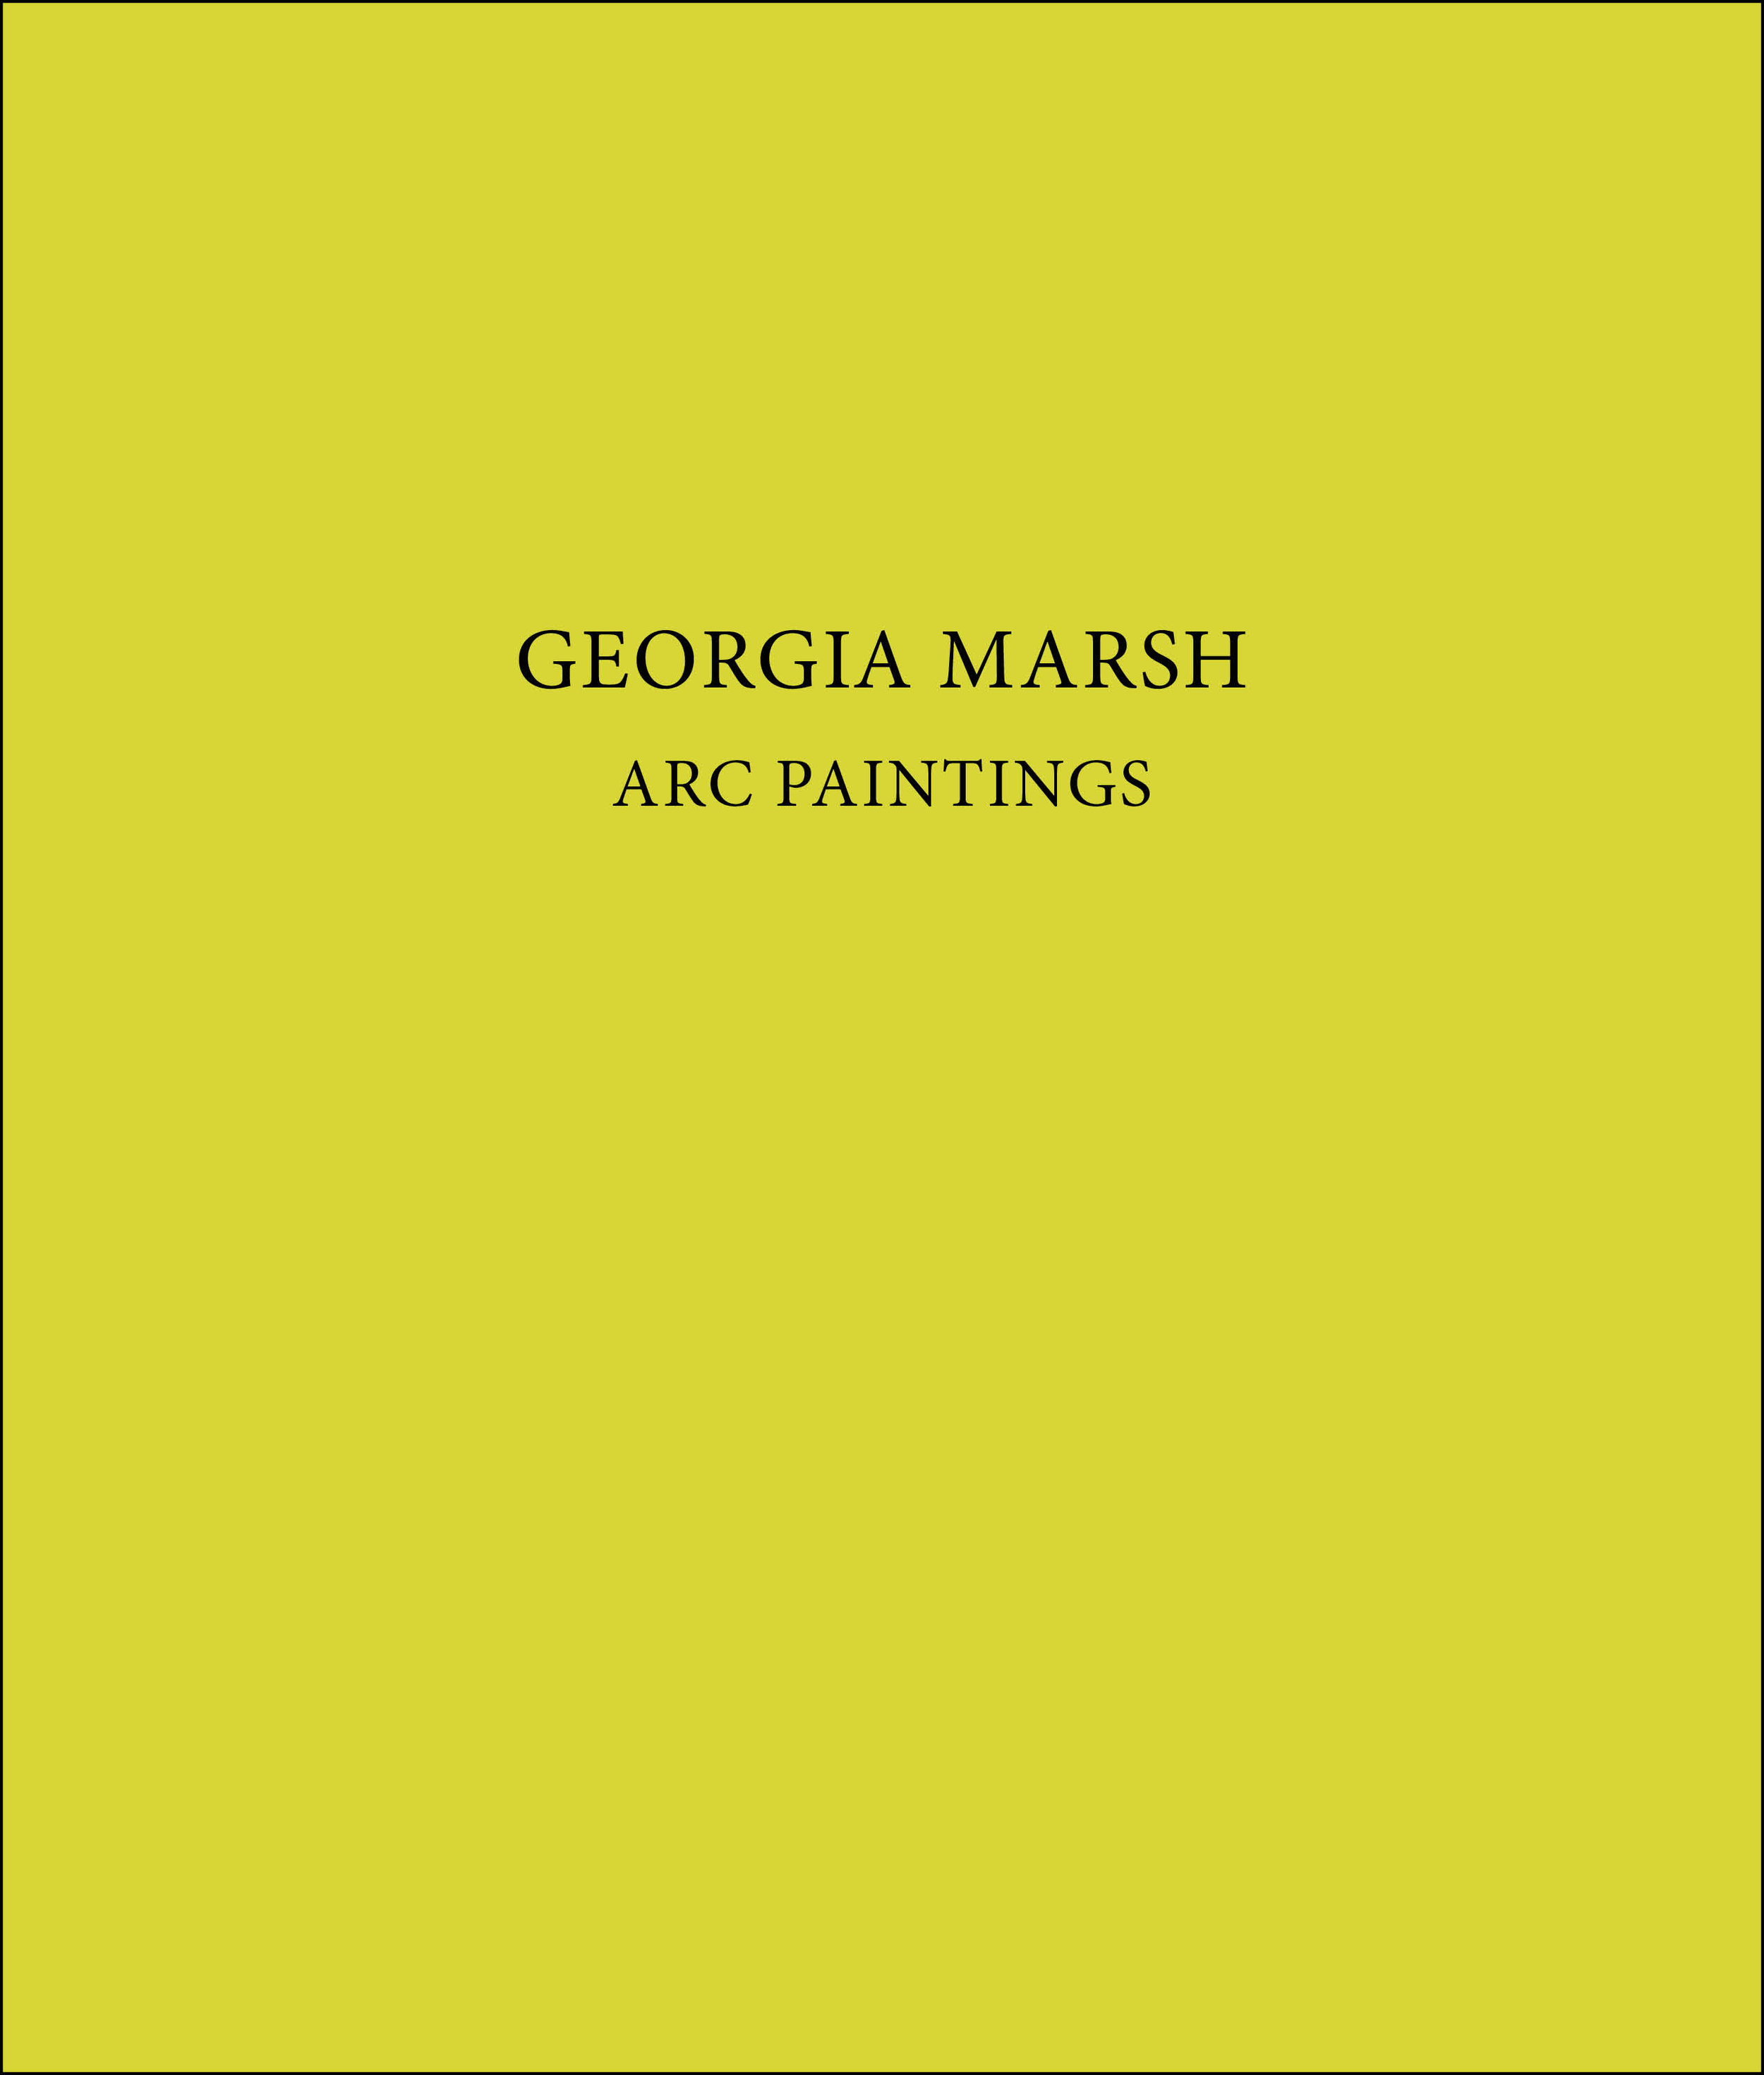 Georgia Marsh